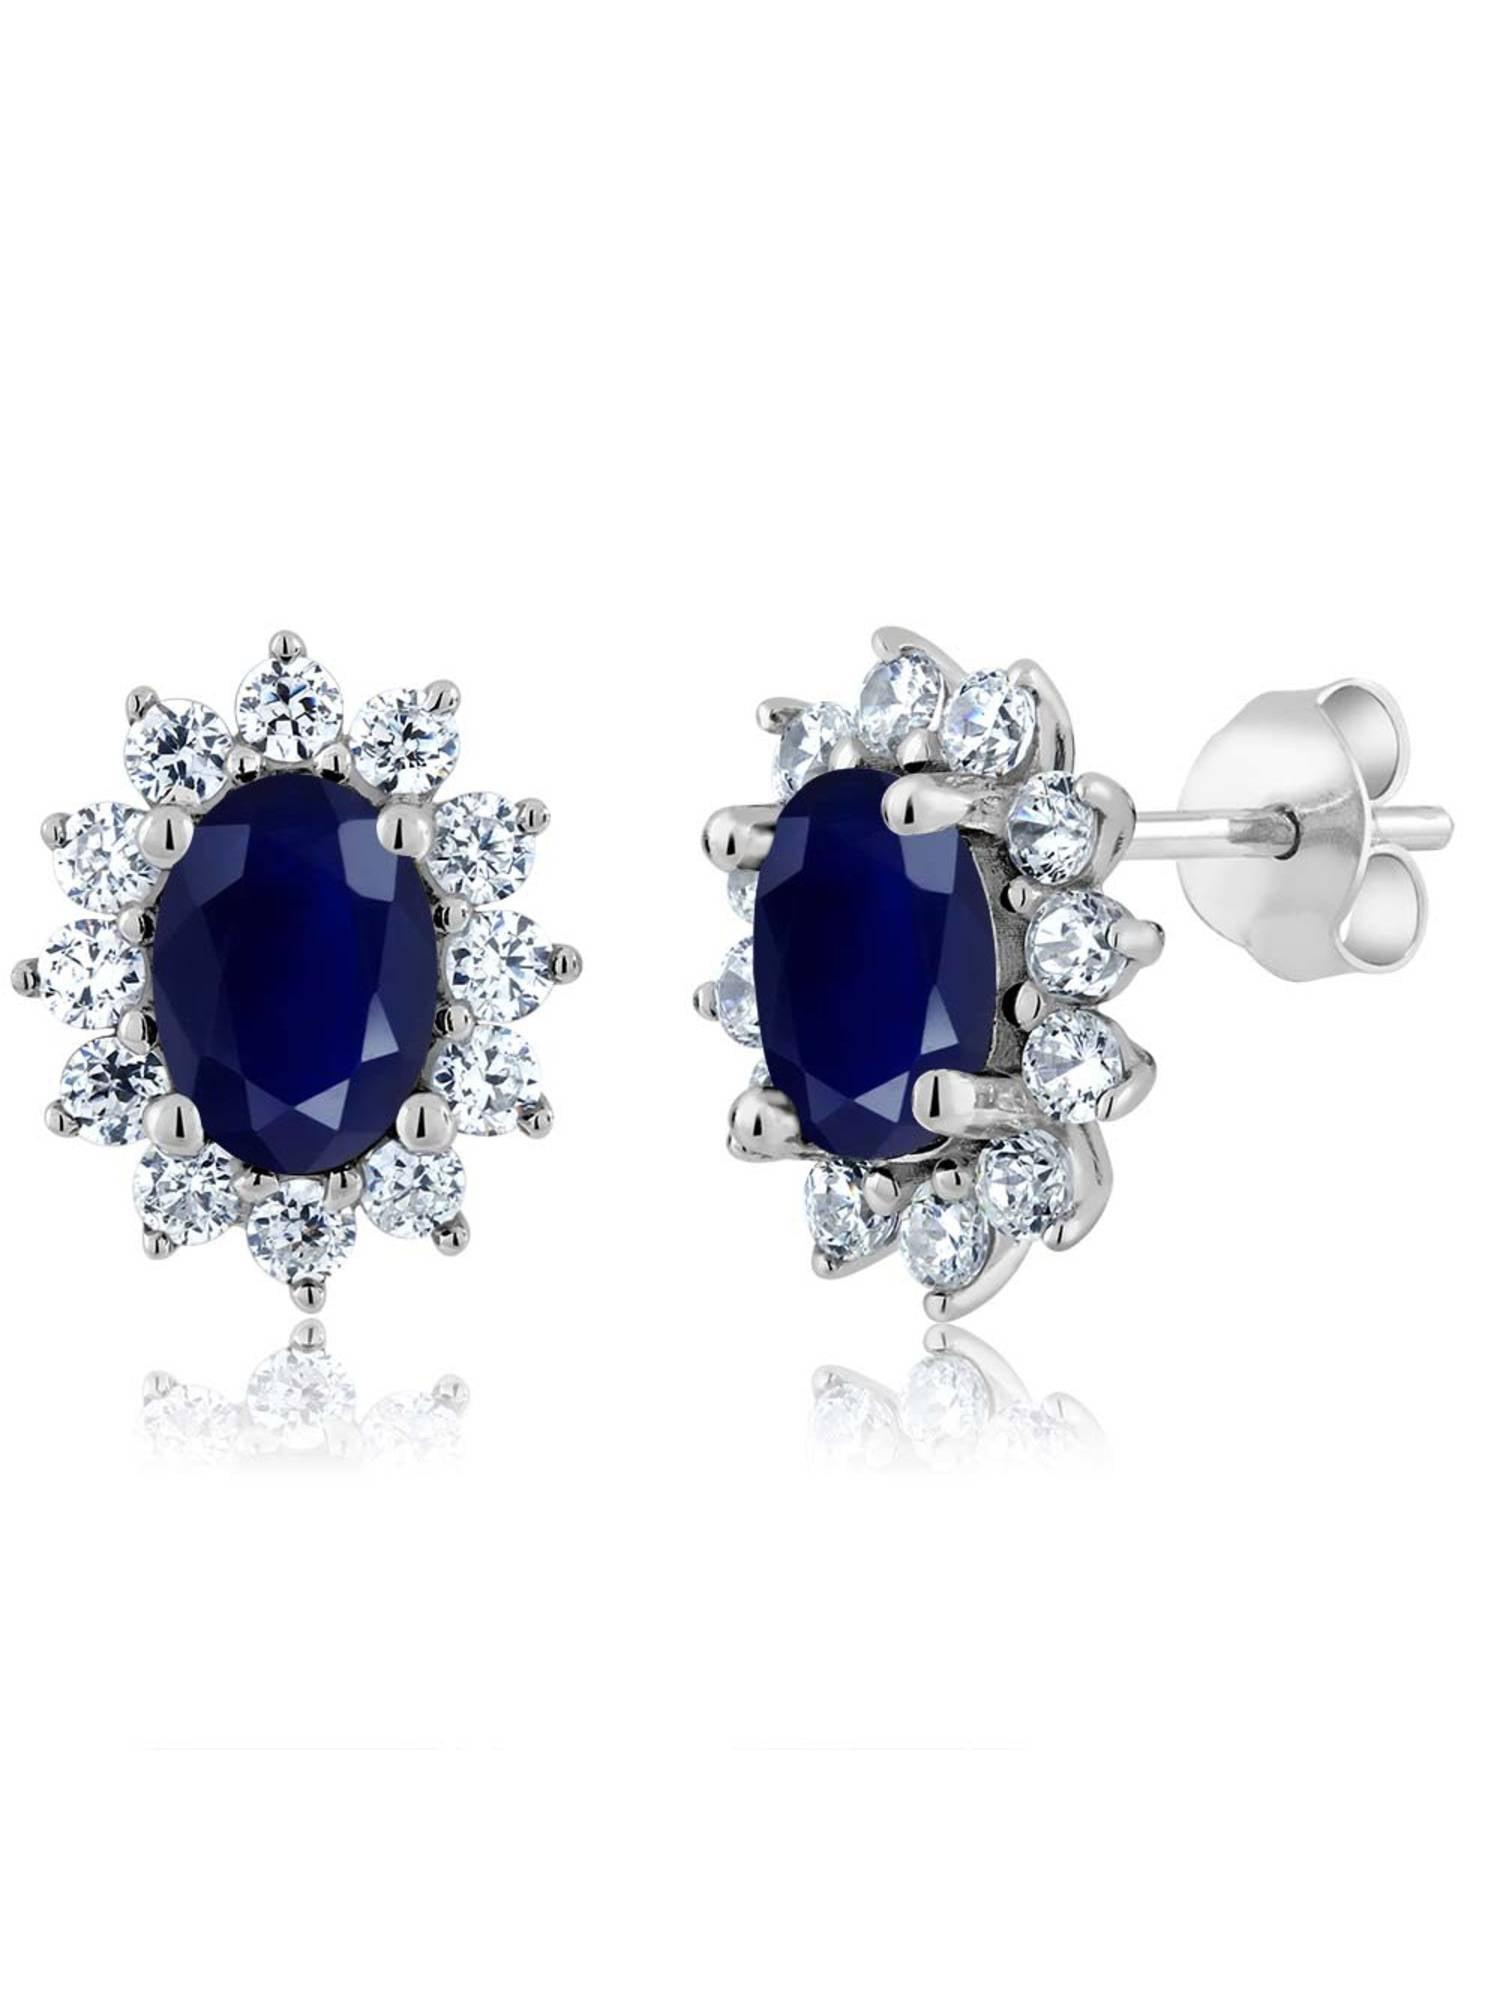 2.76 Ct Oval Blue Sapphire 925 Sterling Silver Earrings